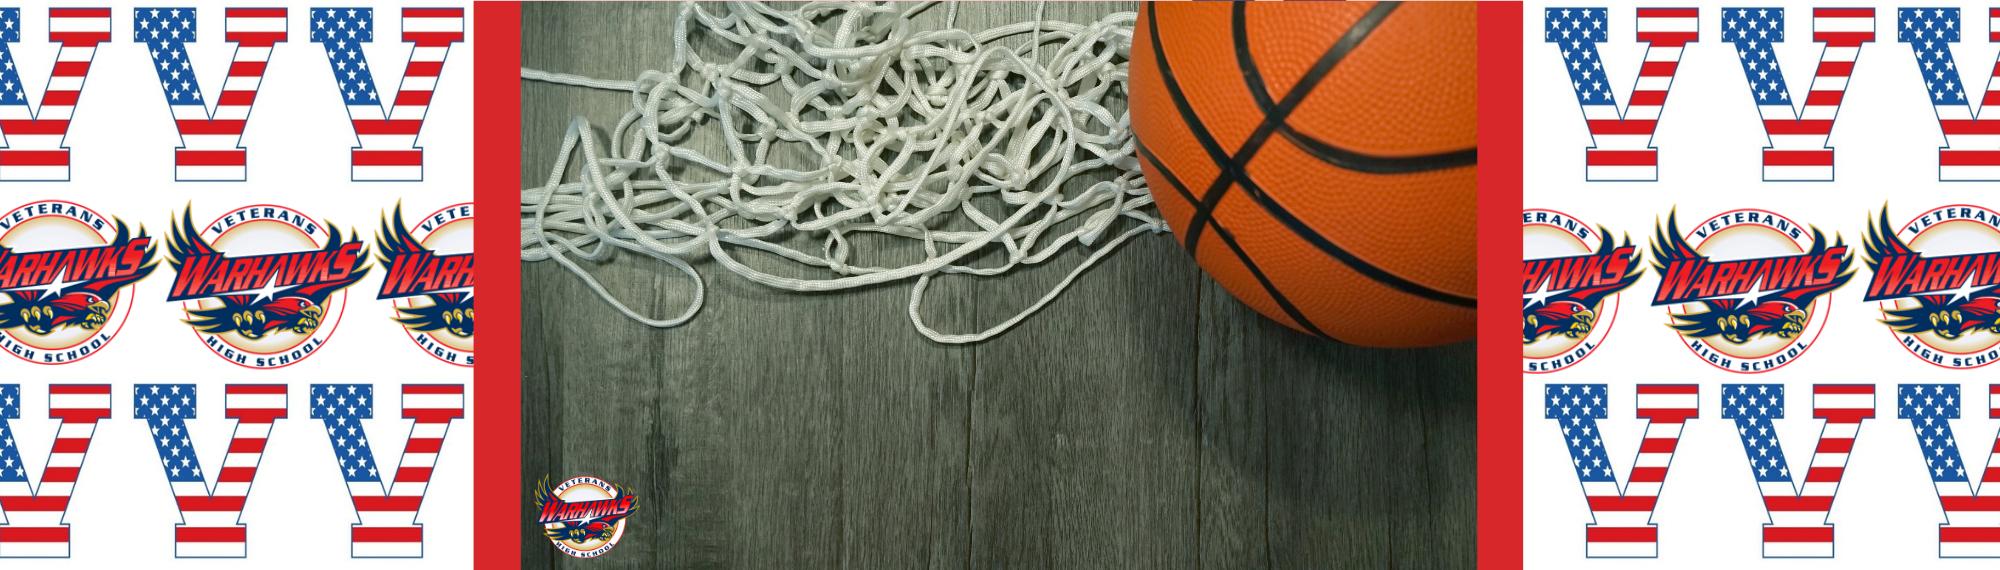 Warhawk Basketball